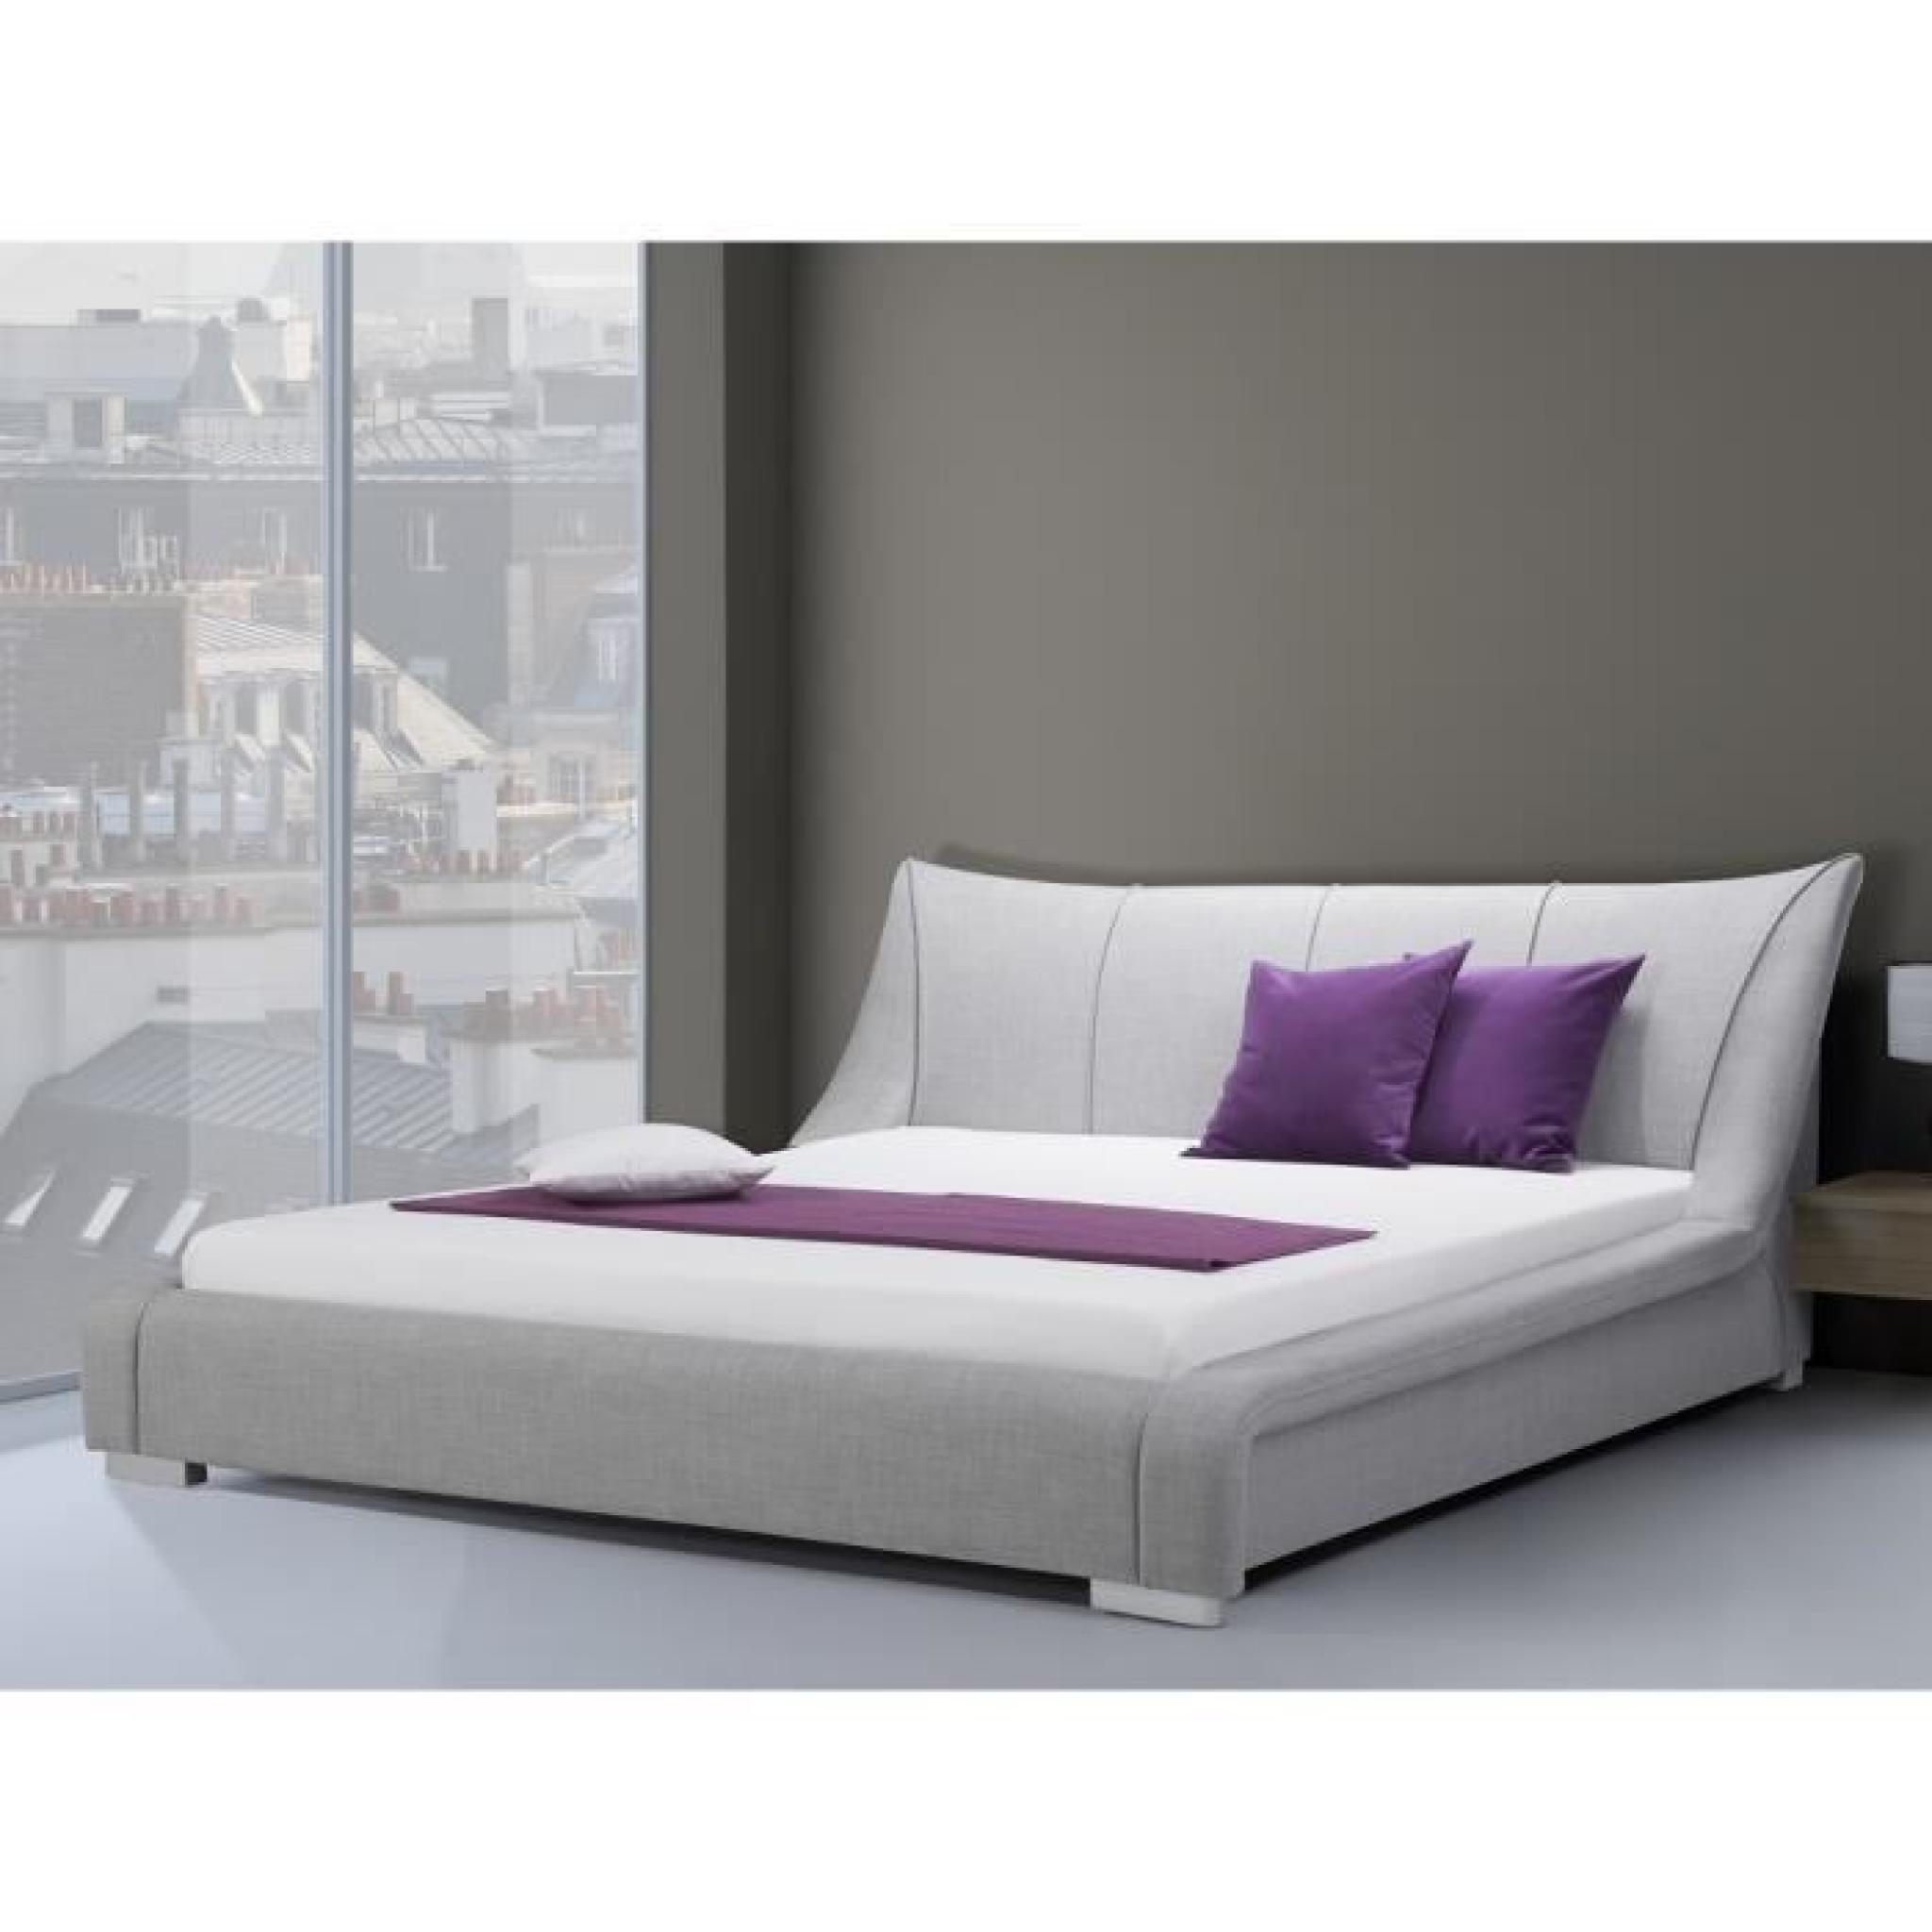 lit design en tissu lit double 180x200 cm gris. Black Bedroom Furniture Sets. Home Design Ideas